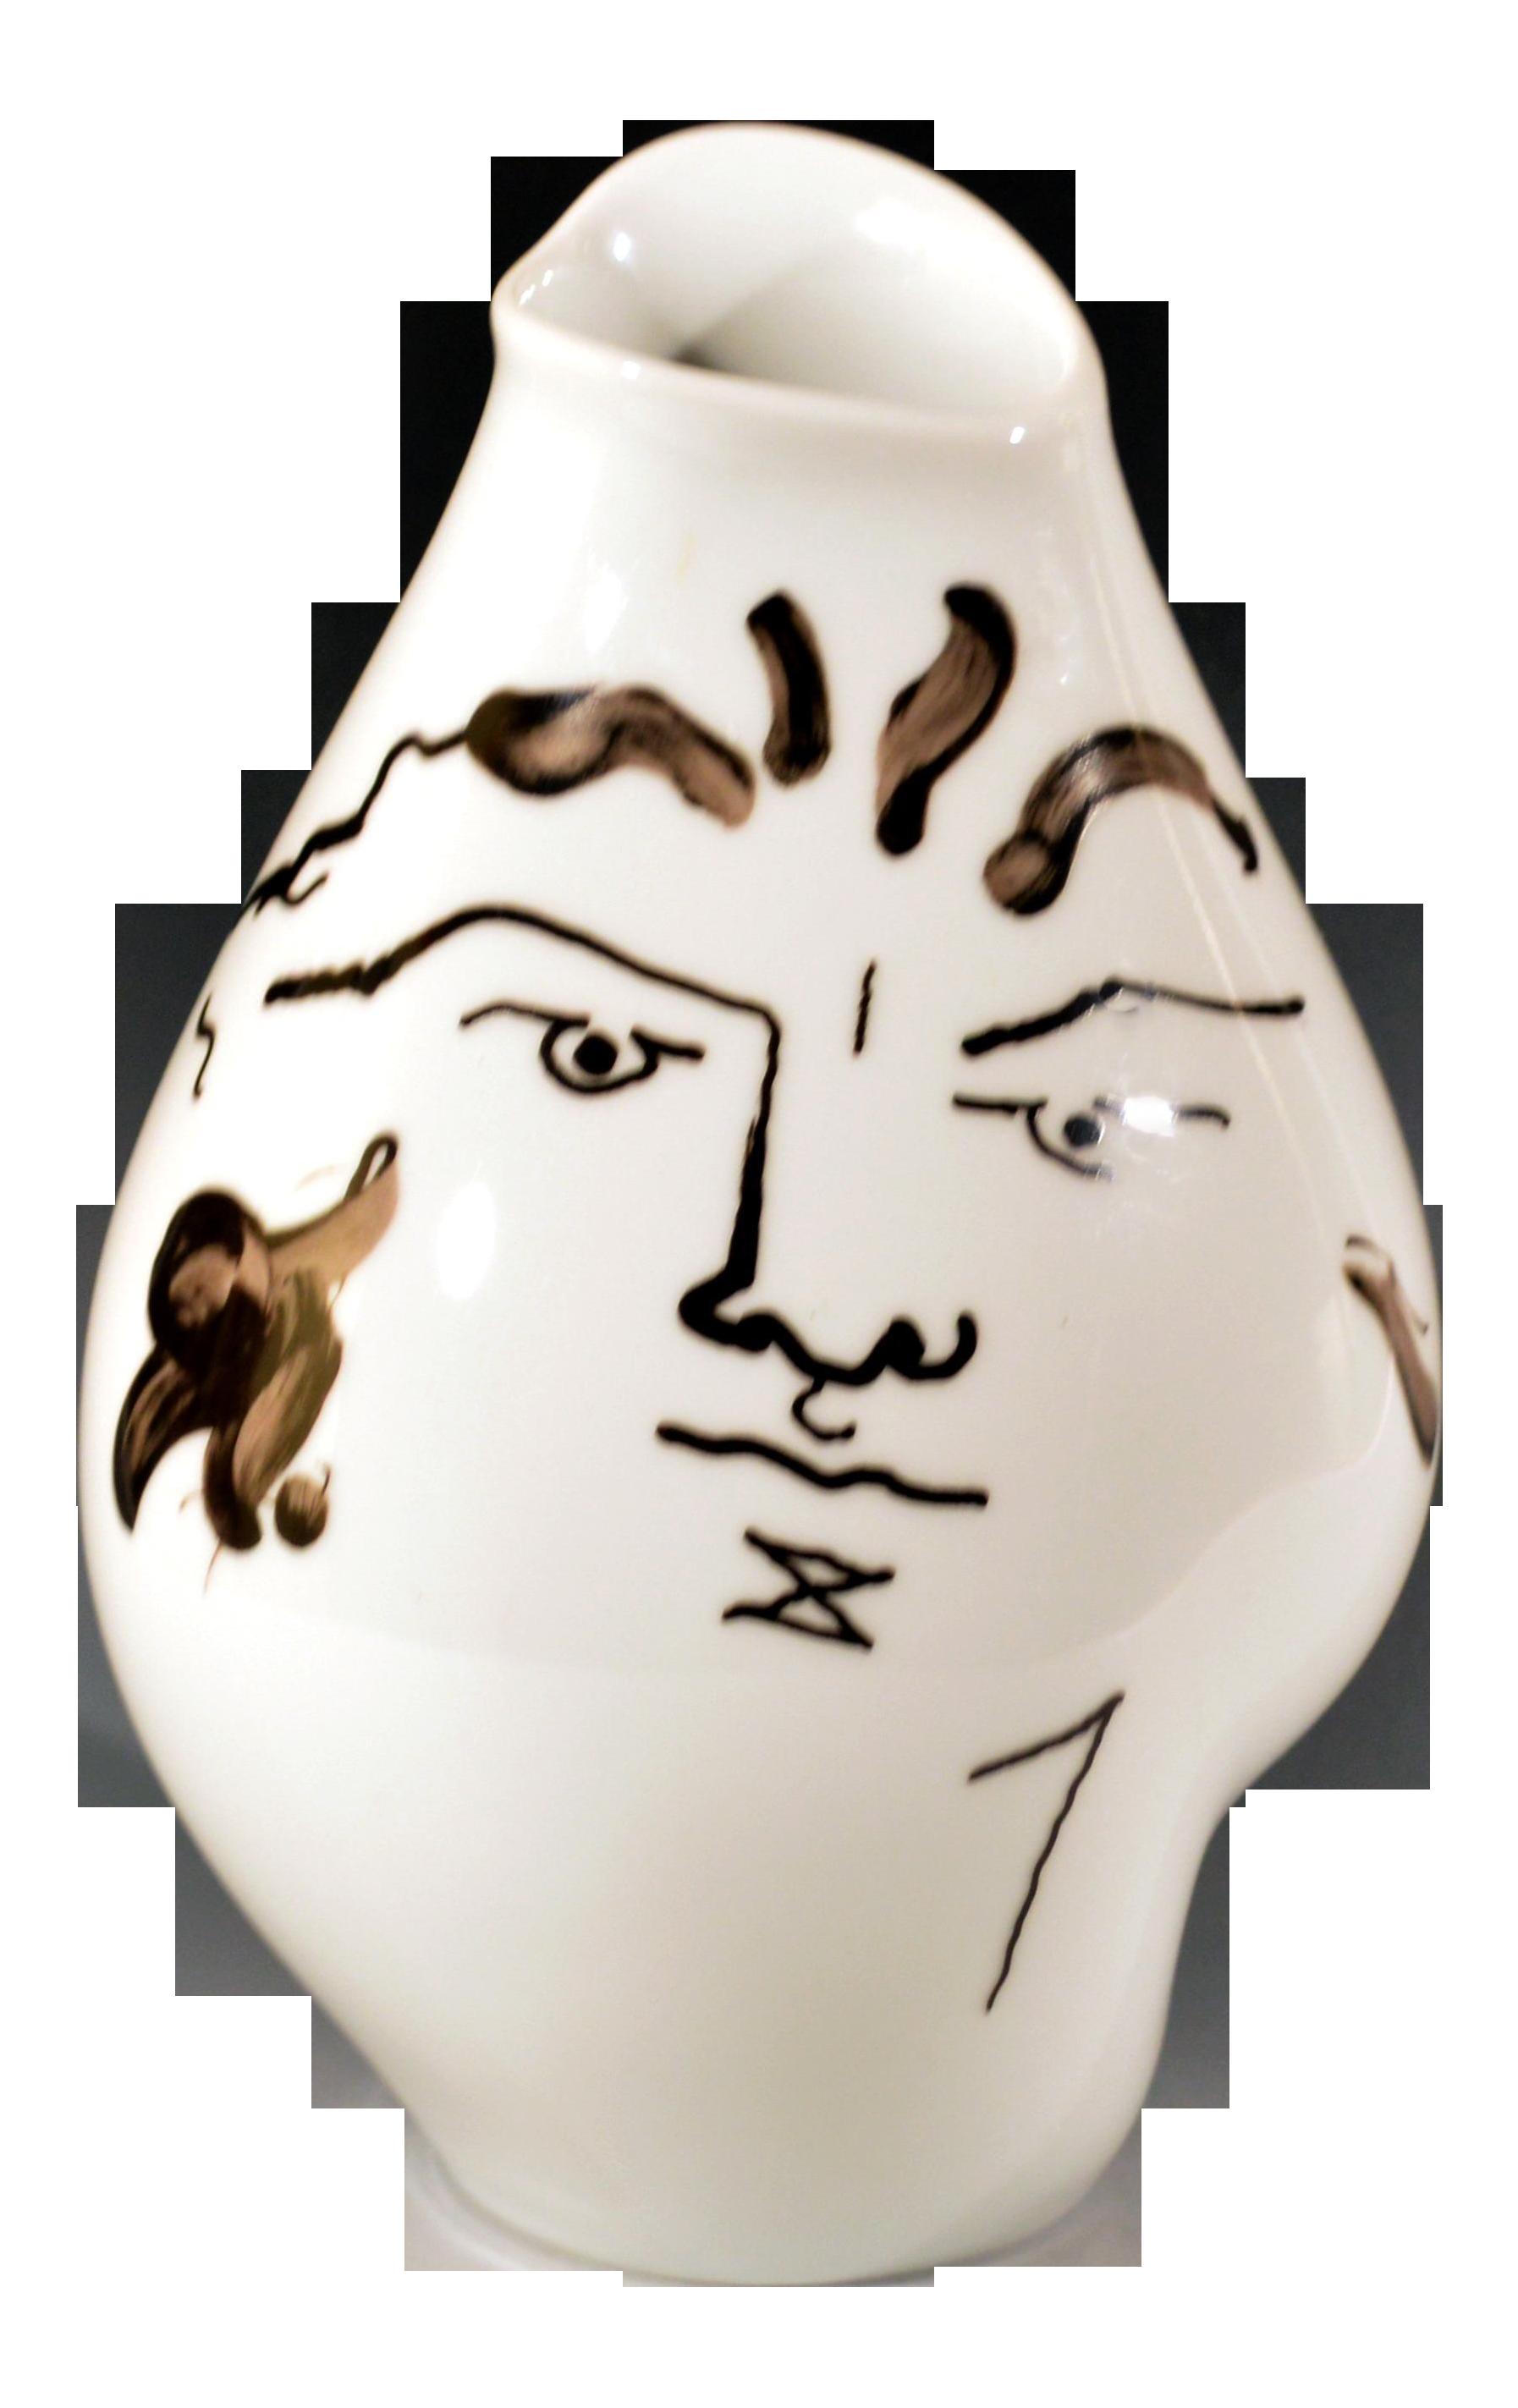 Vintage jean cocteau porcelain vase by rosenthal chairish for Sofa global 6450